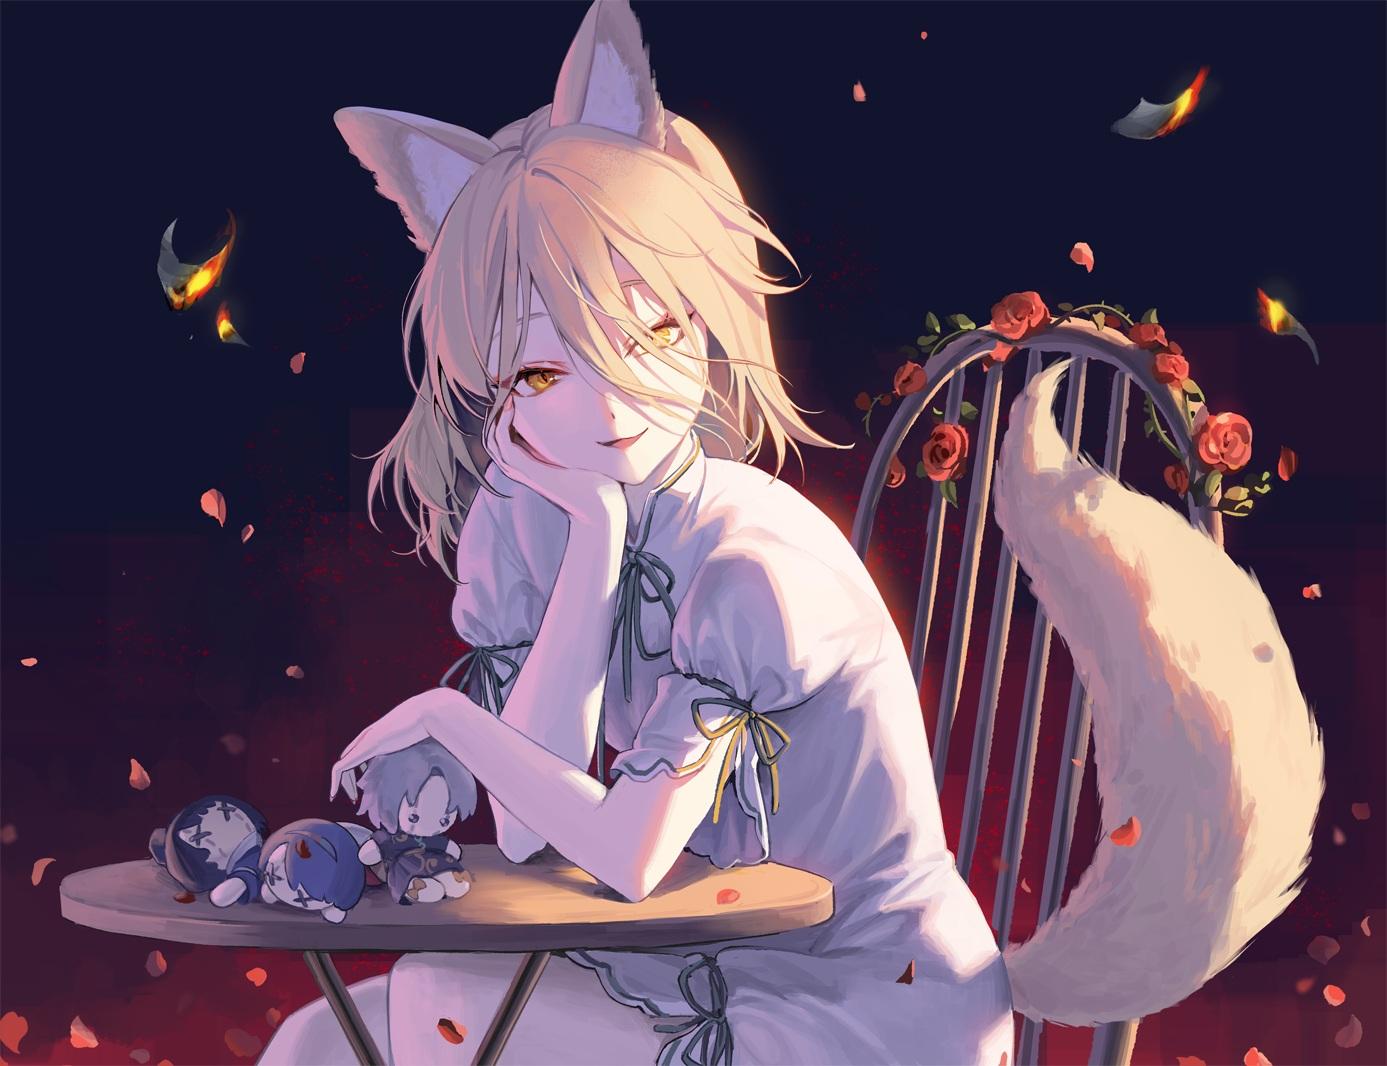 animal_ears blonde_hair doll dress flowers foxgirl hajin kudamaki_tsukasa petals rose tail touhou yellow_eyes